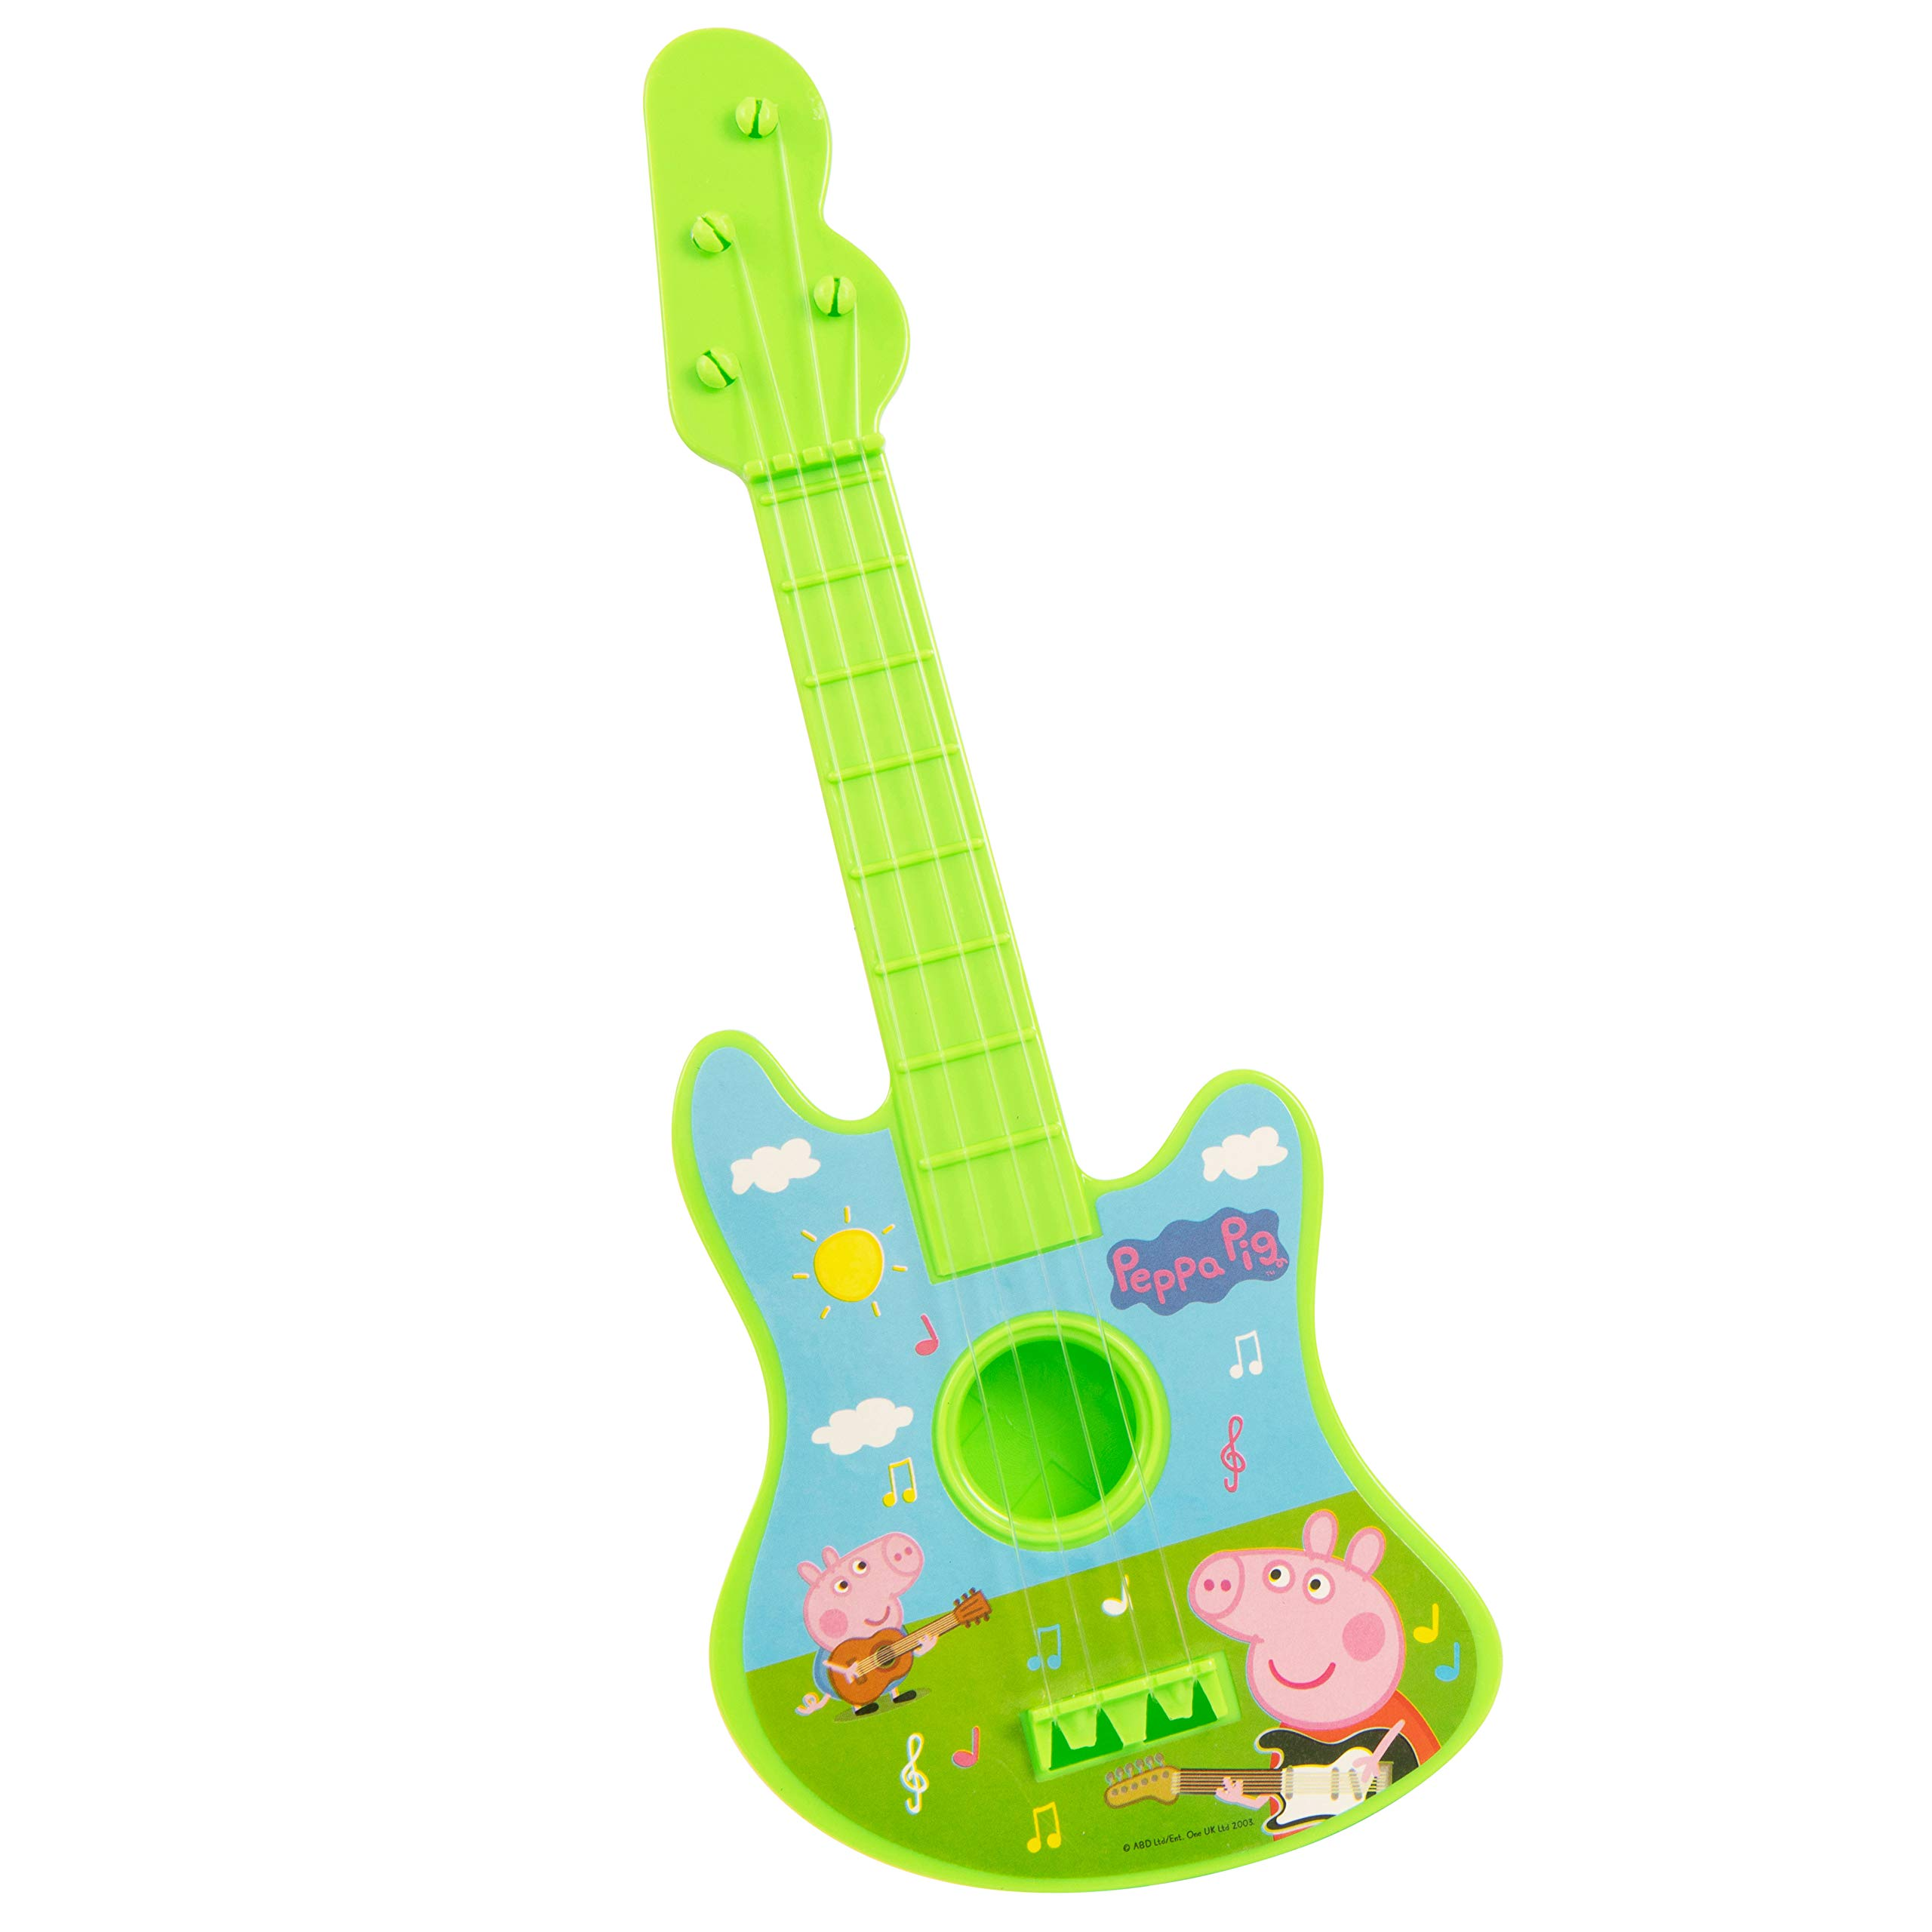 Peppa Pig Guitar [Colors May Vary]